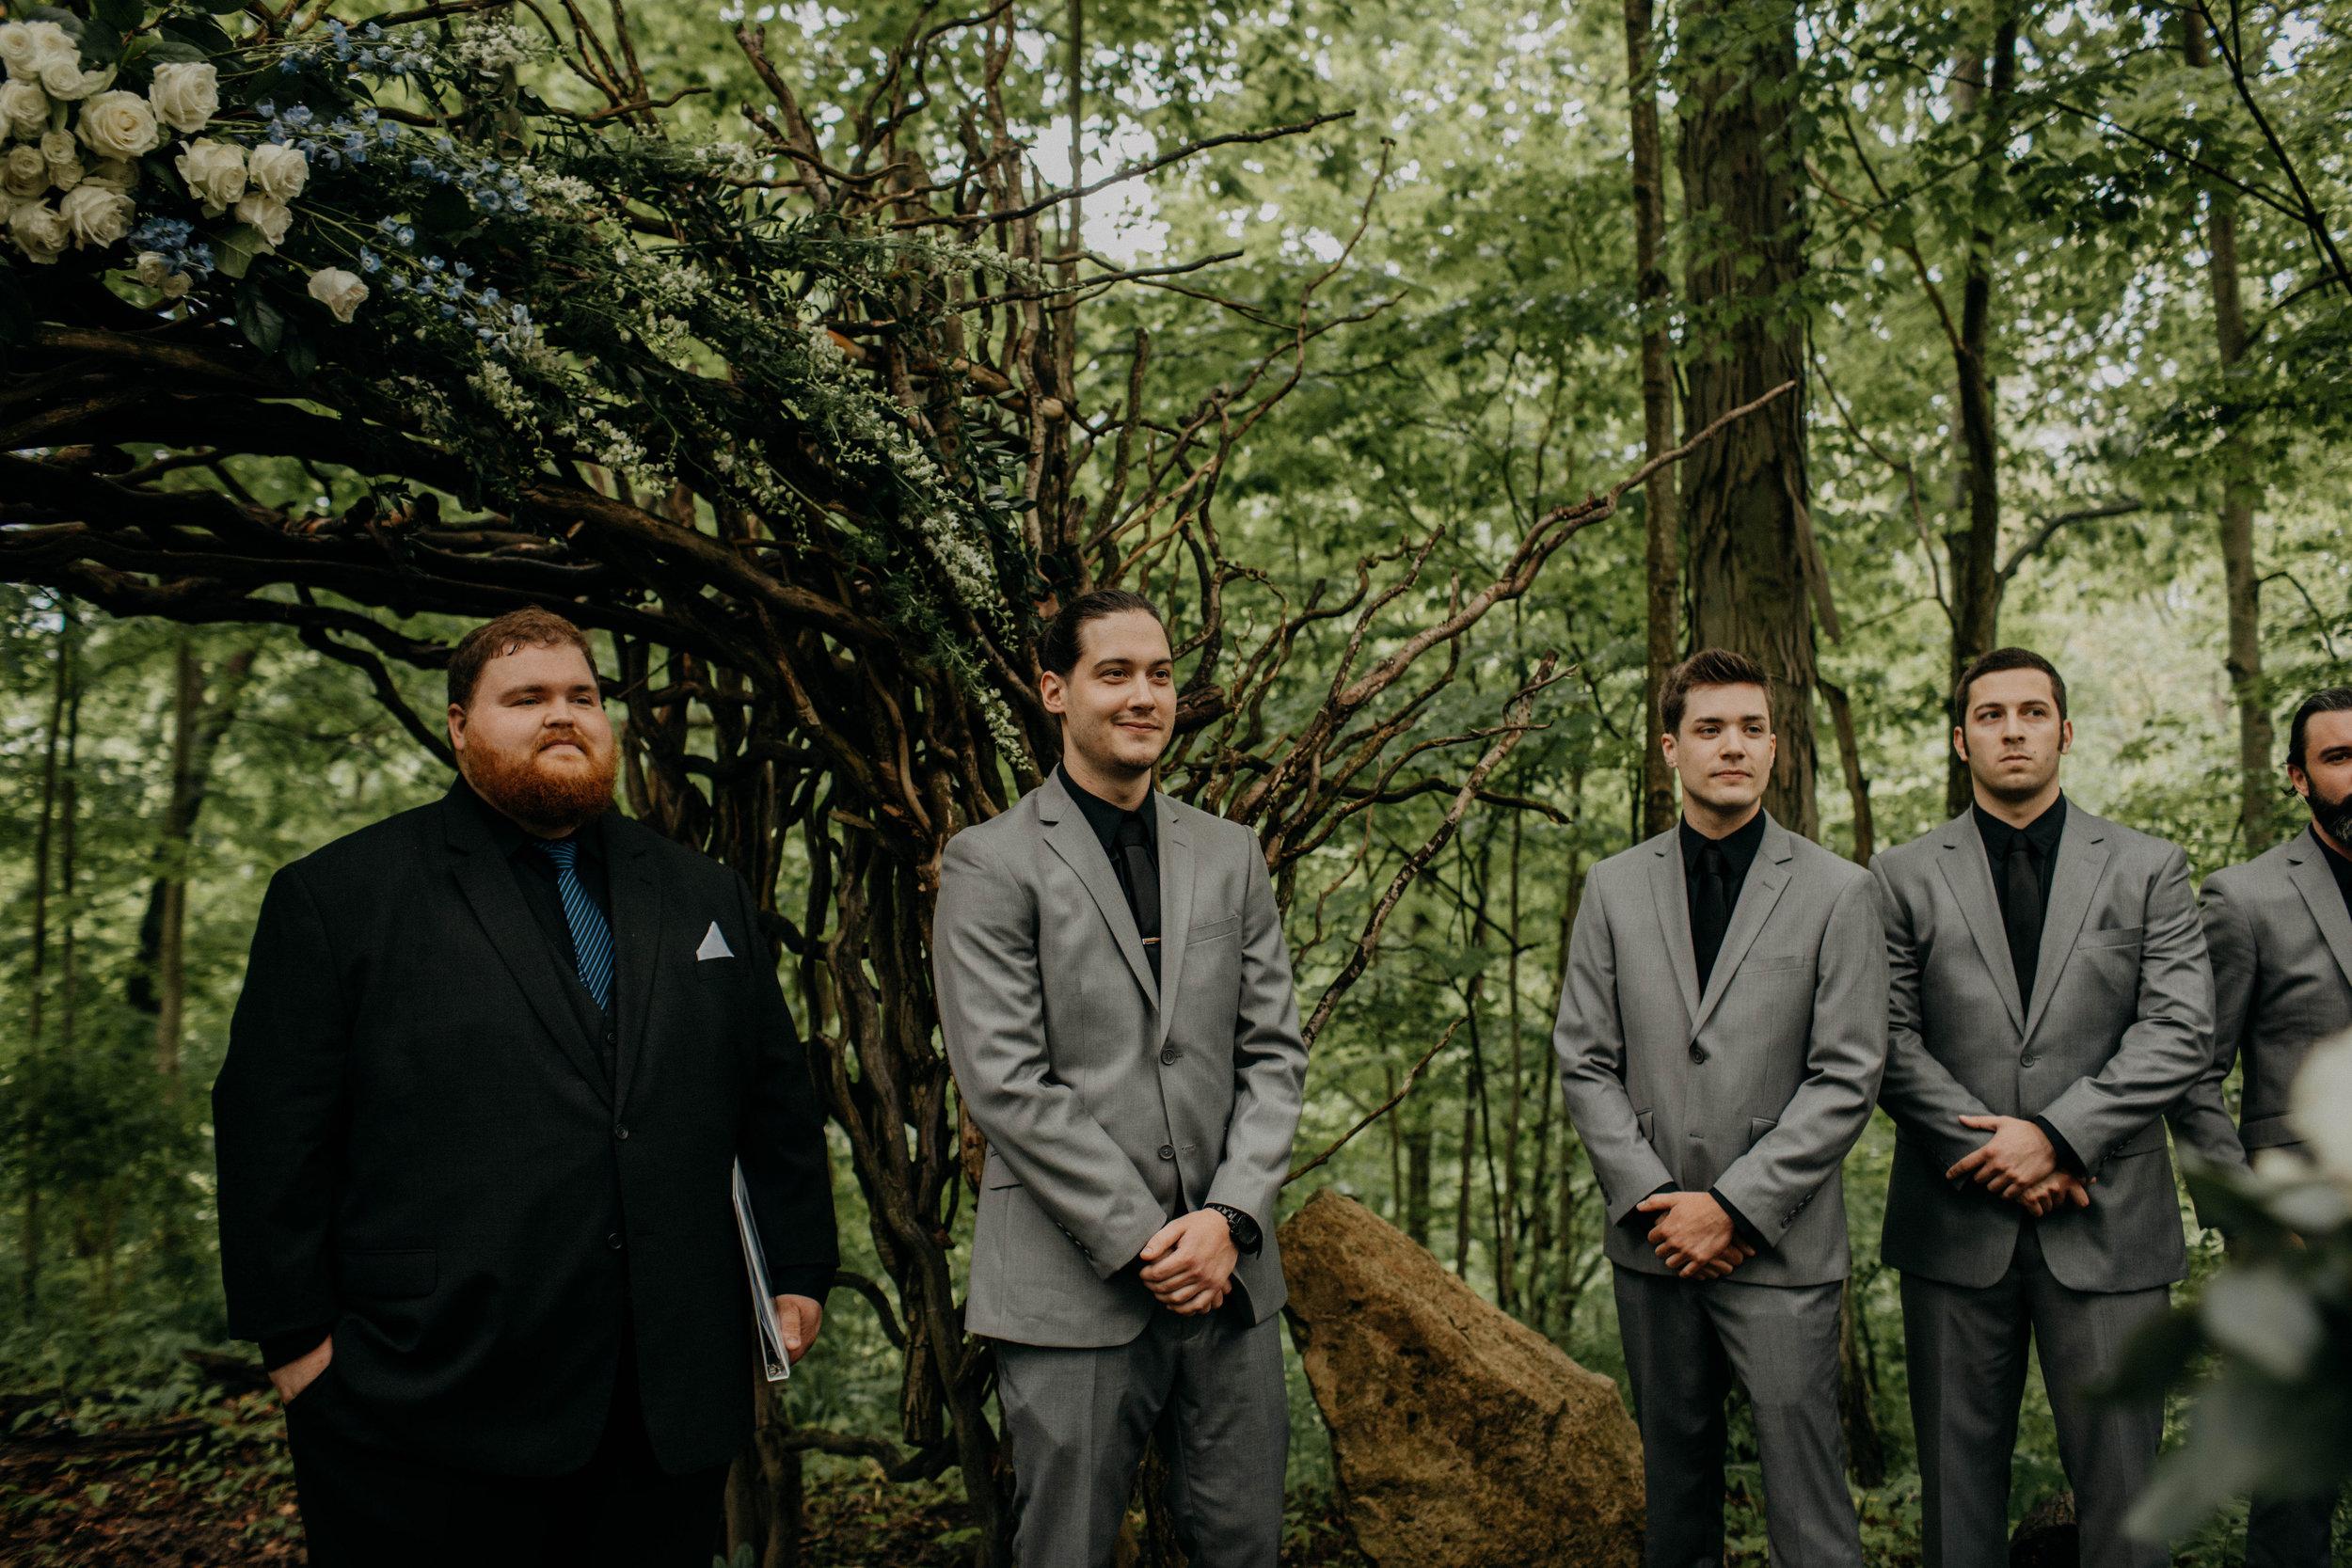 Columbus ohio wedding photographer canyon run ranch wedding grace e jones photography wedding photographer84.jpg